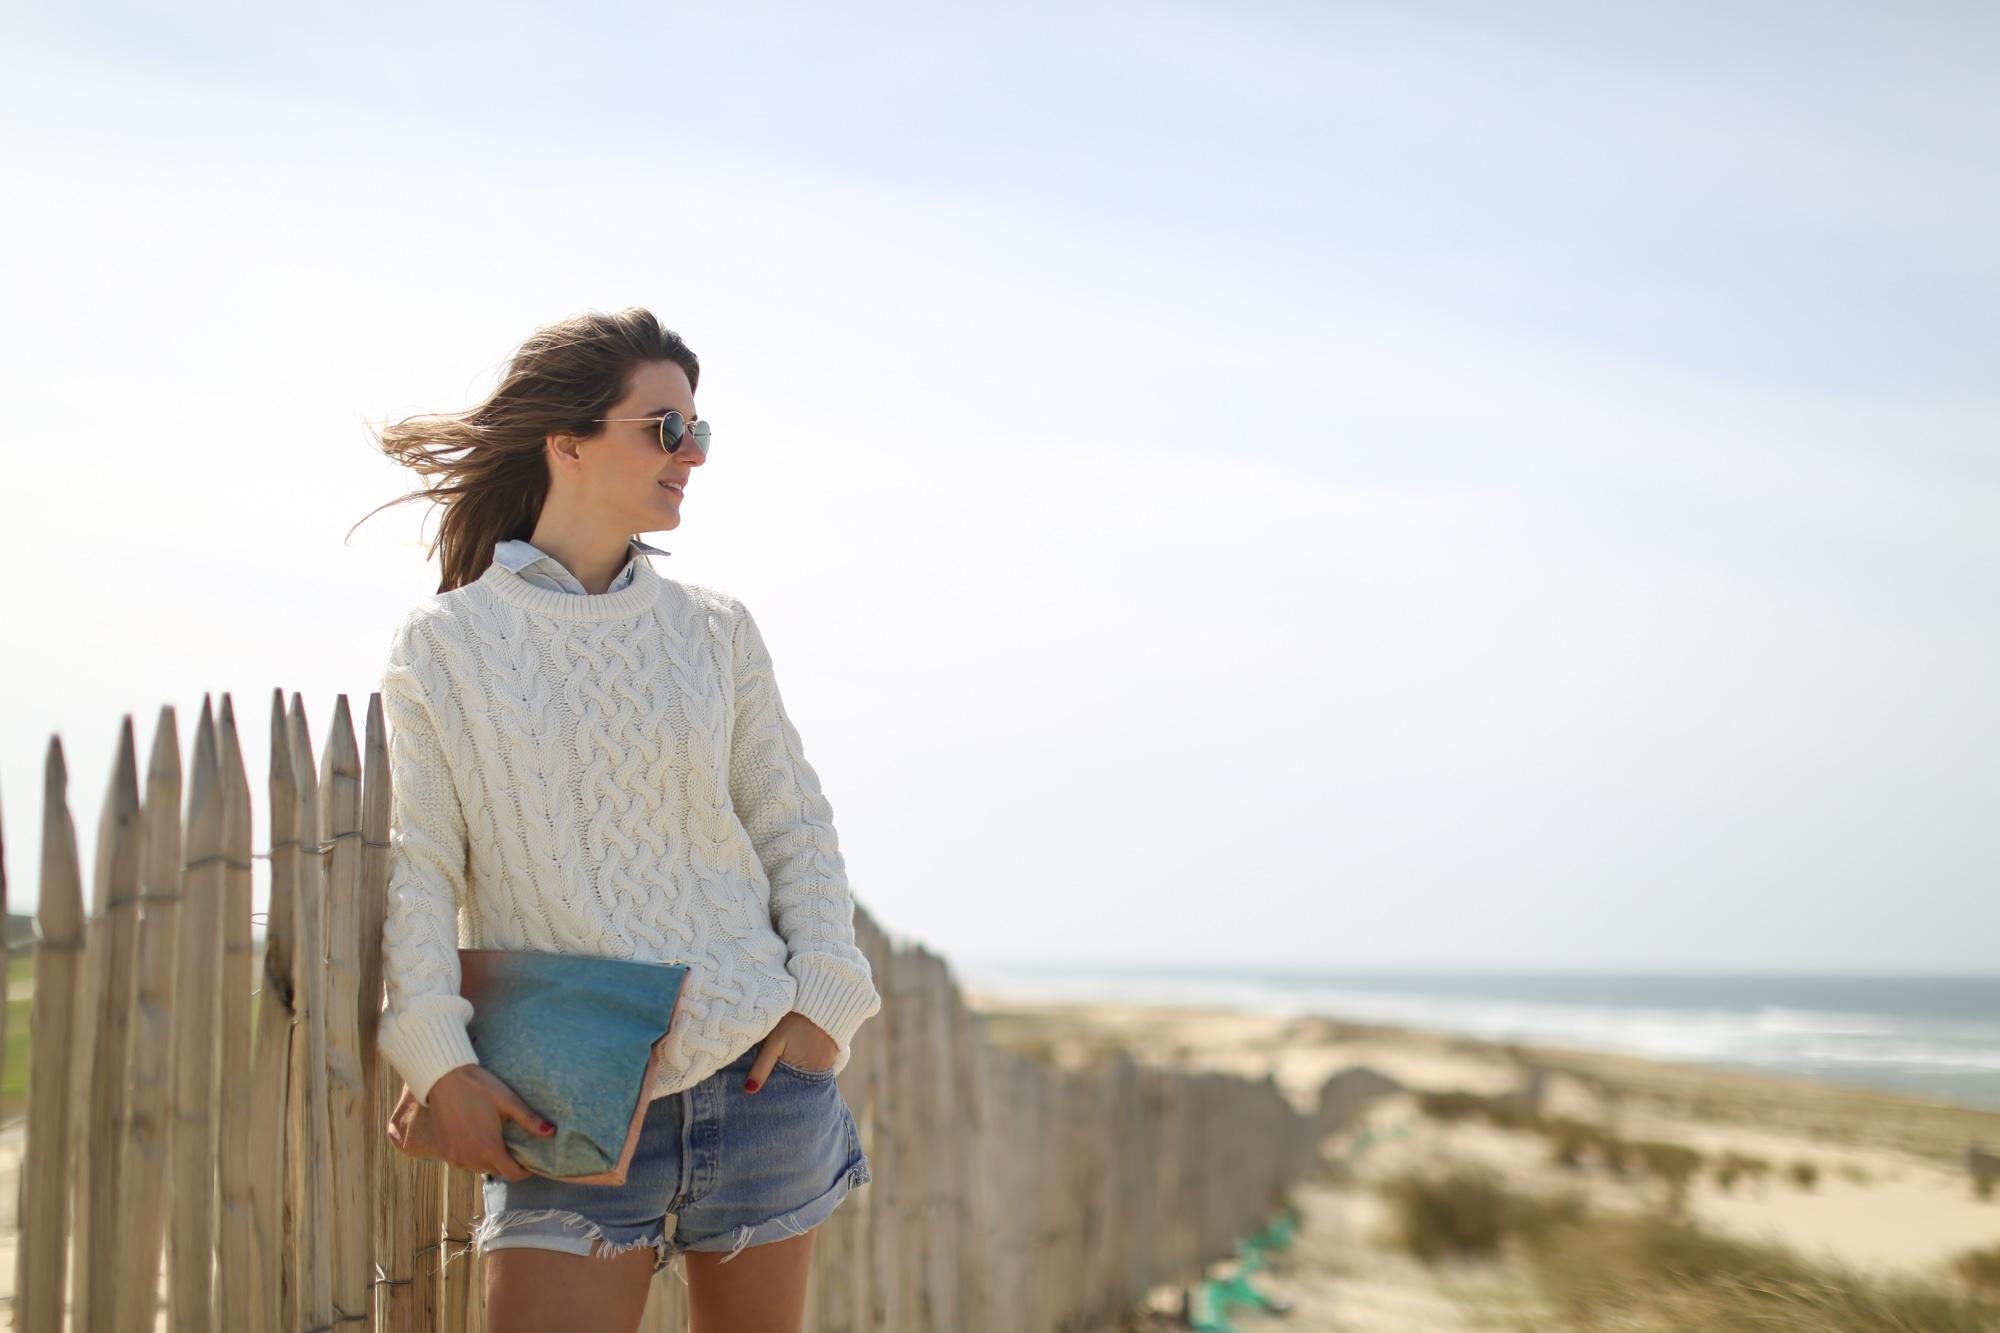 Clochet-streetstyle-levis-501-vintage-shorts-superga-crochet-thalatta-concept-bathers-pouch-7